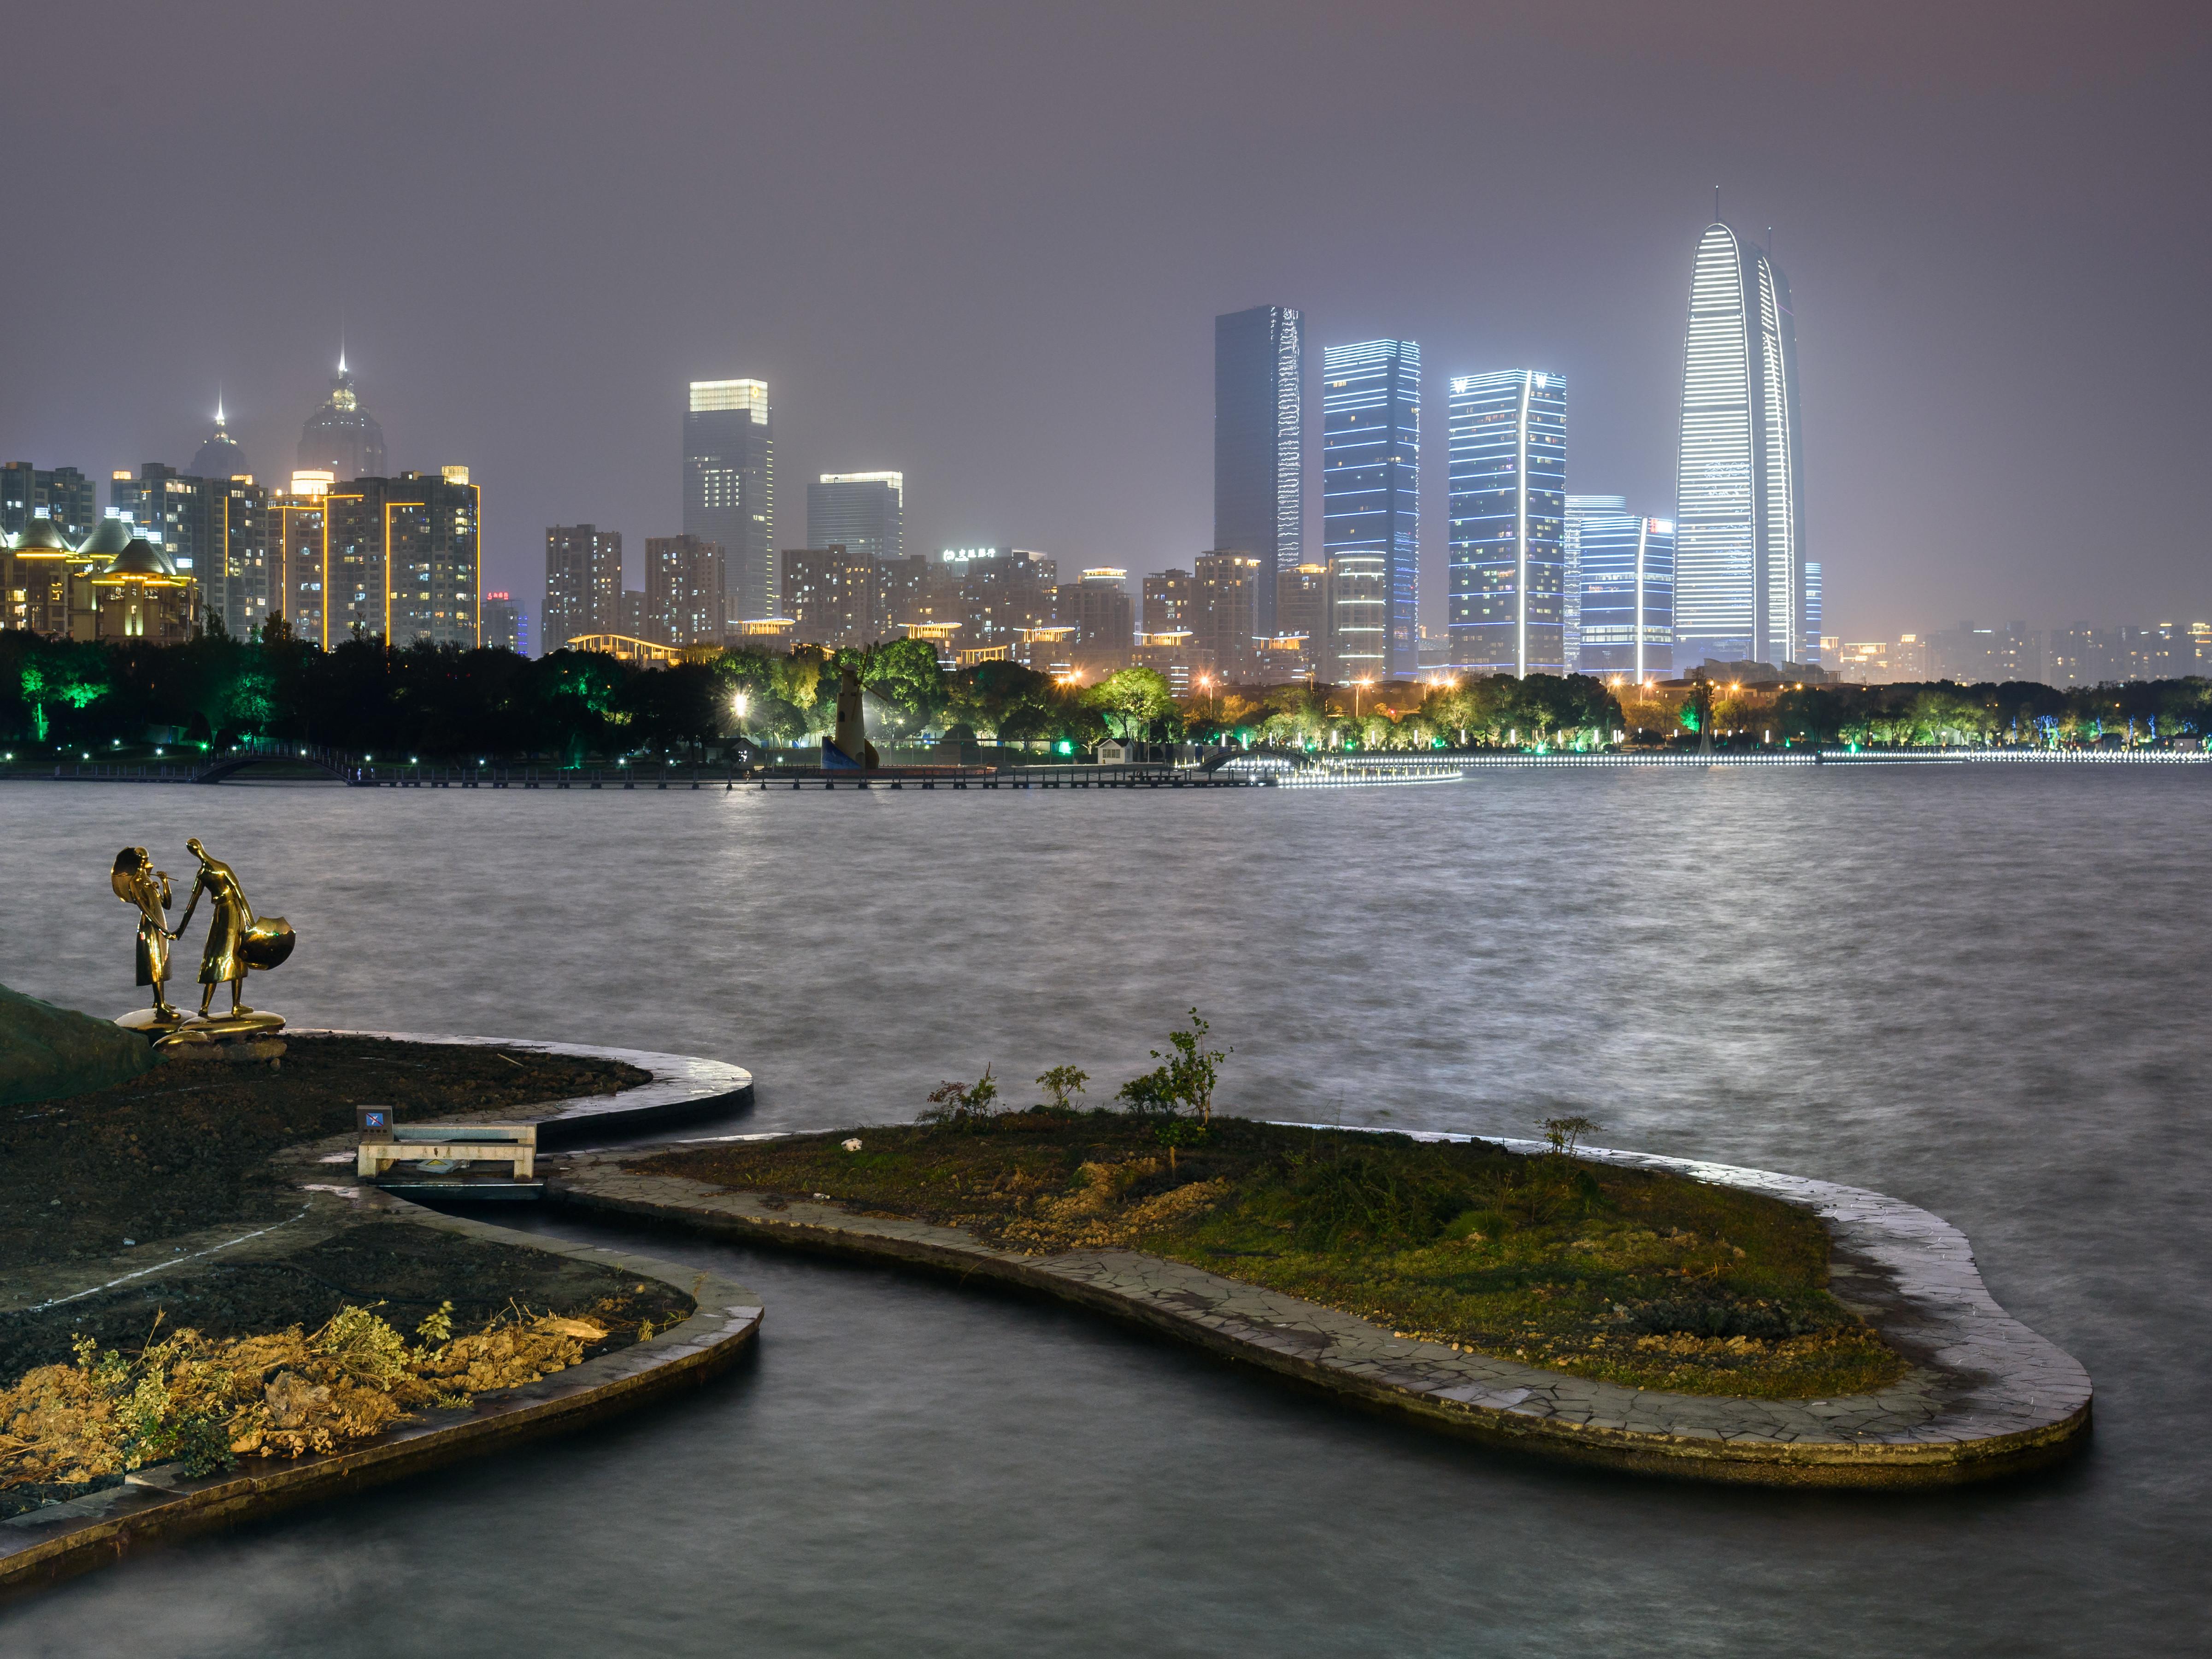 City skyline across Jinji Lake, Suzhou, China.